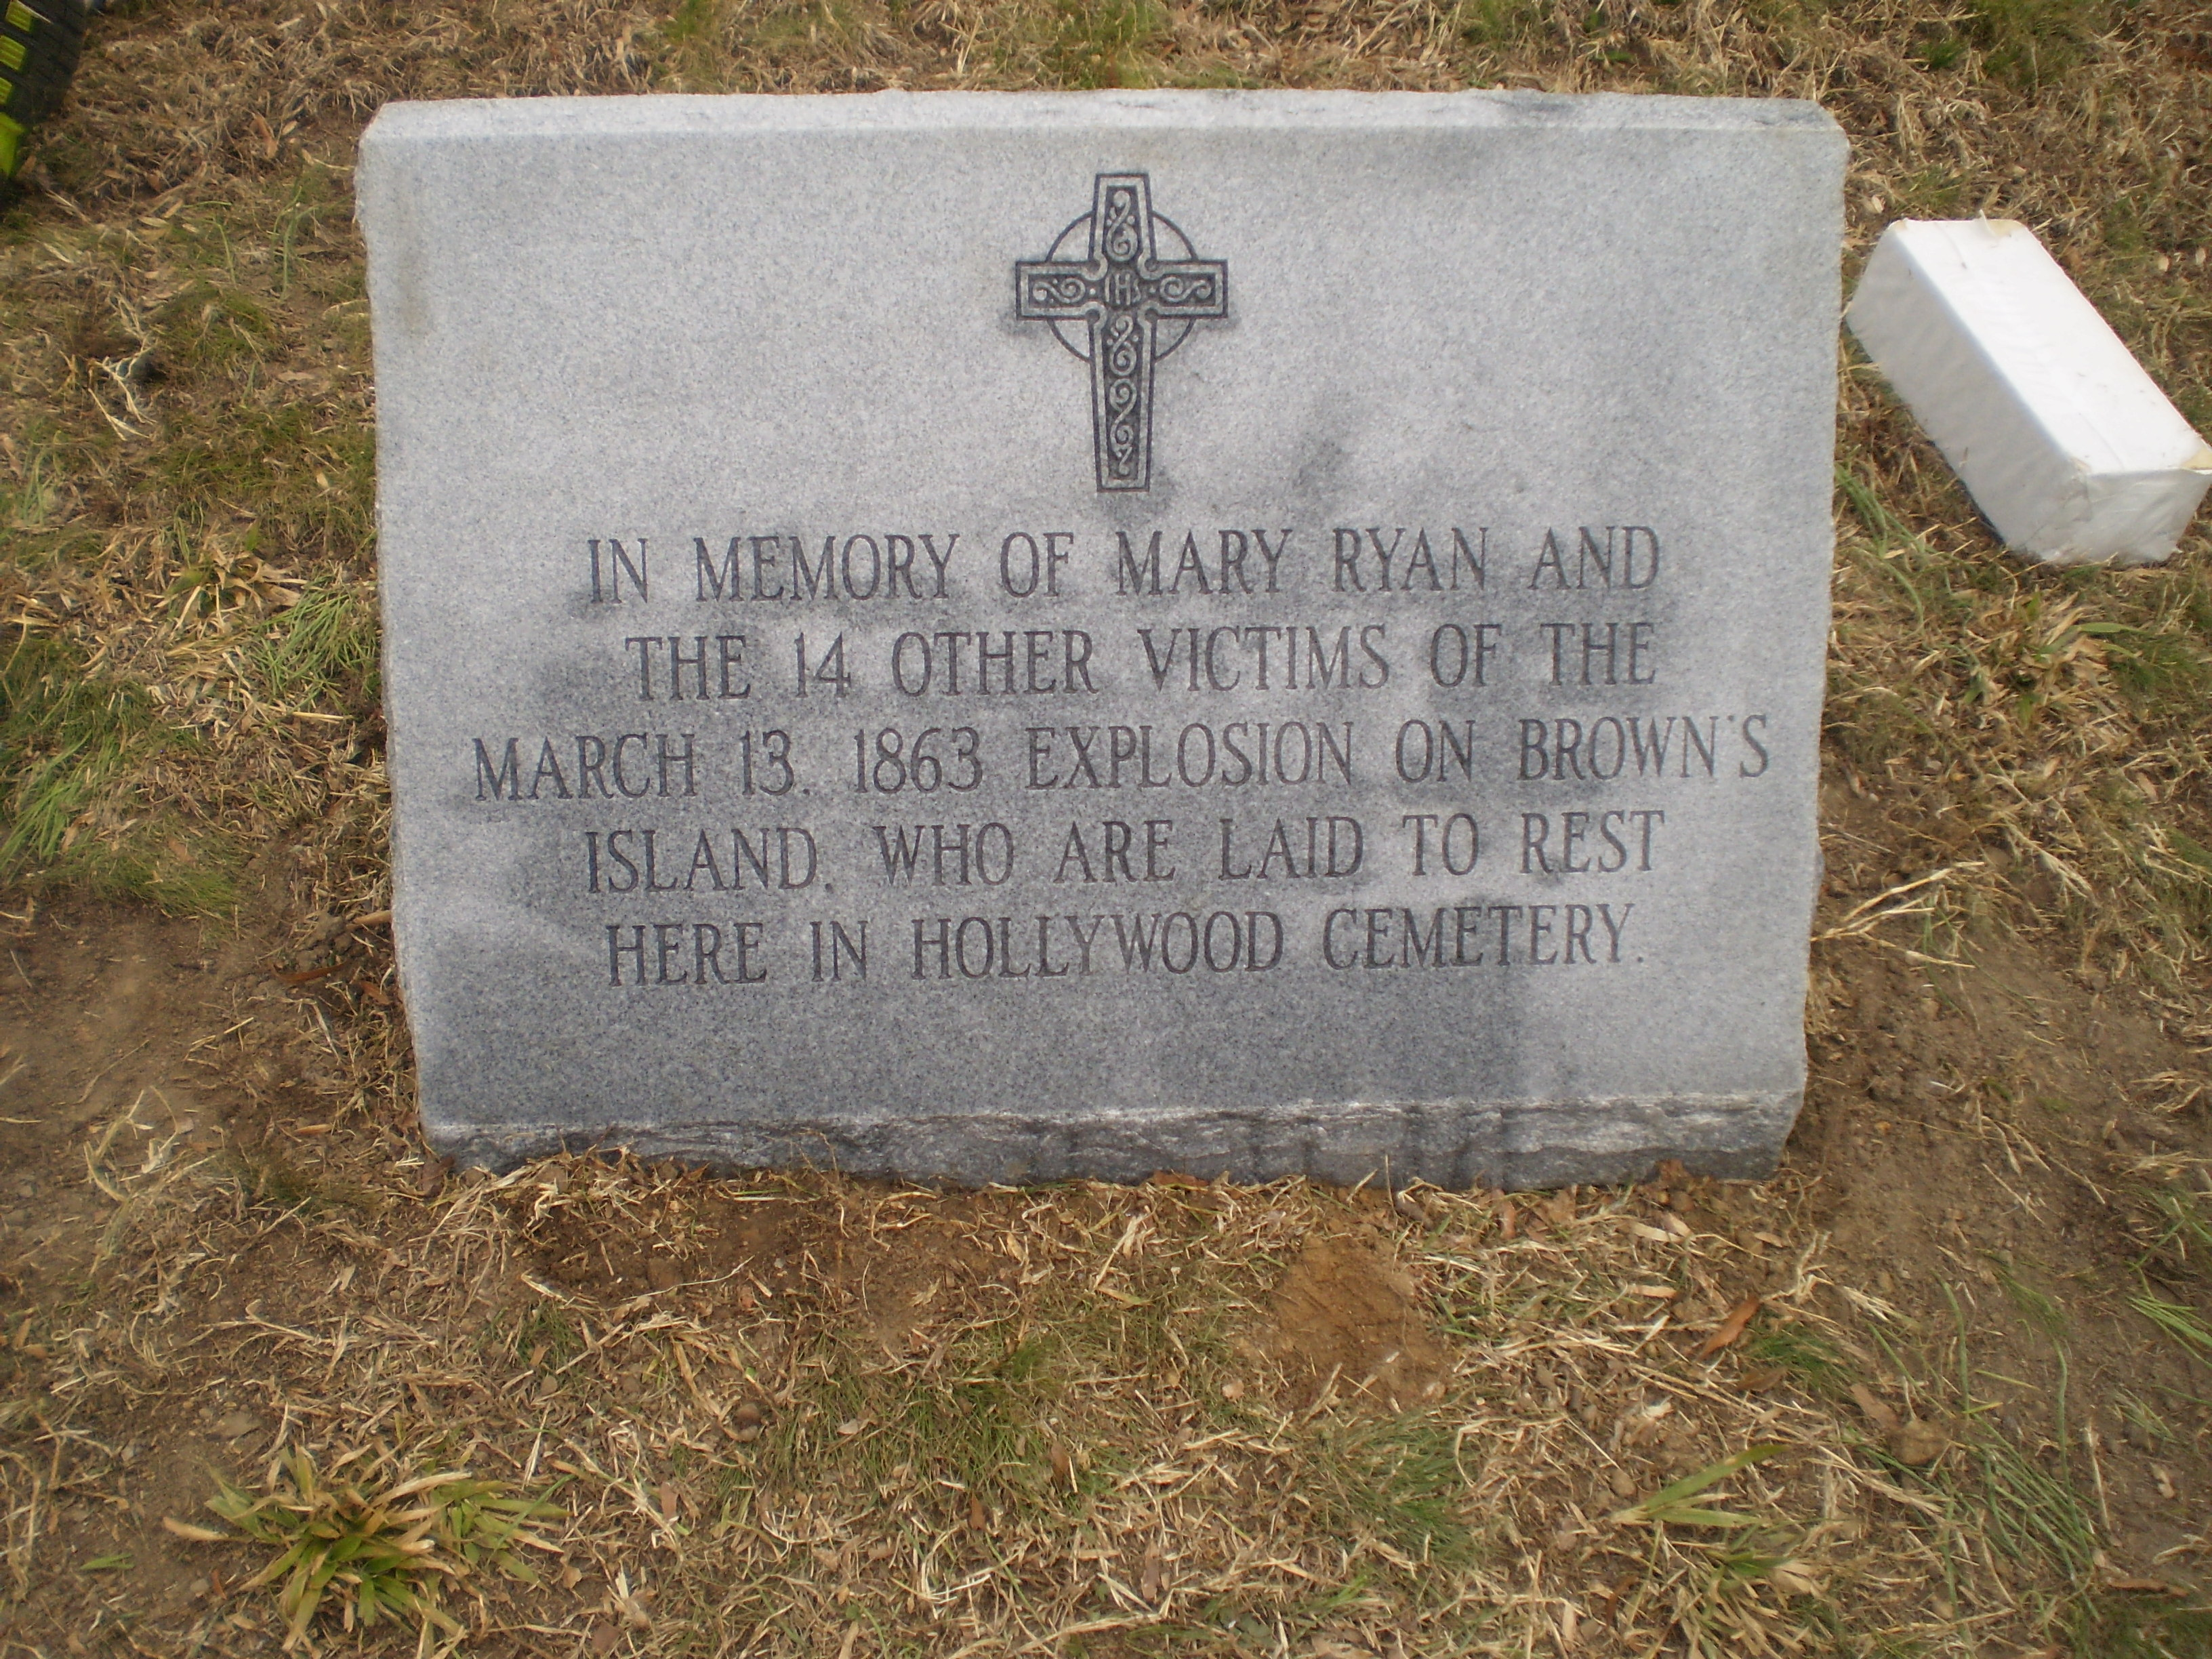 Mary Ryan Memorial